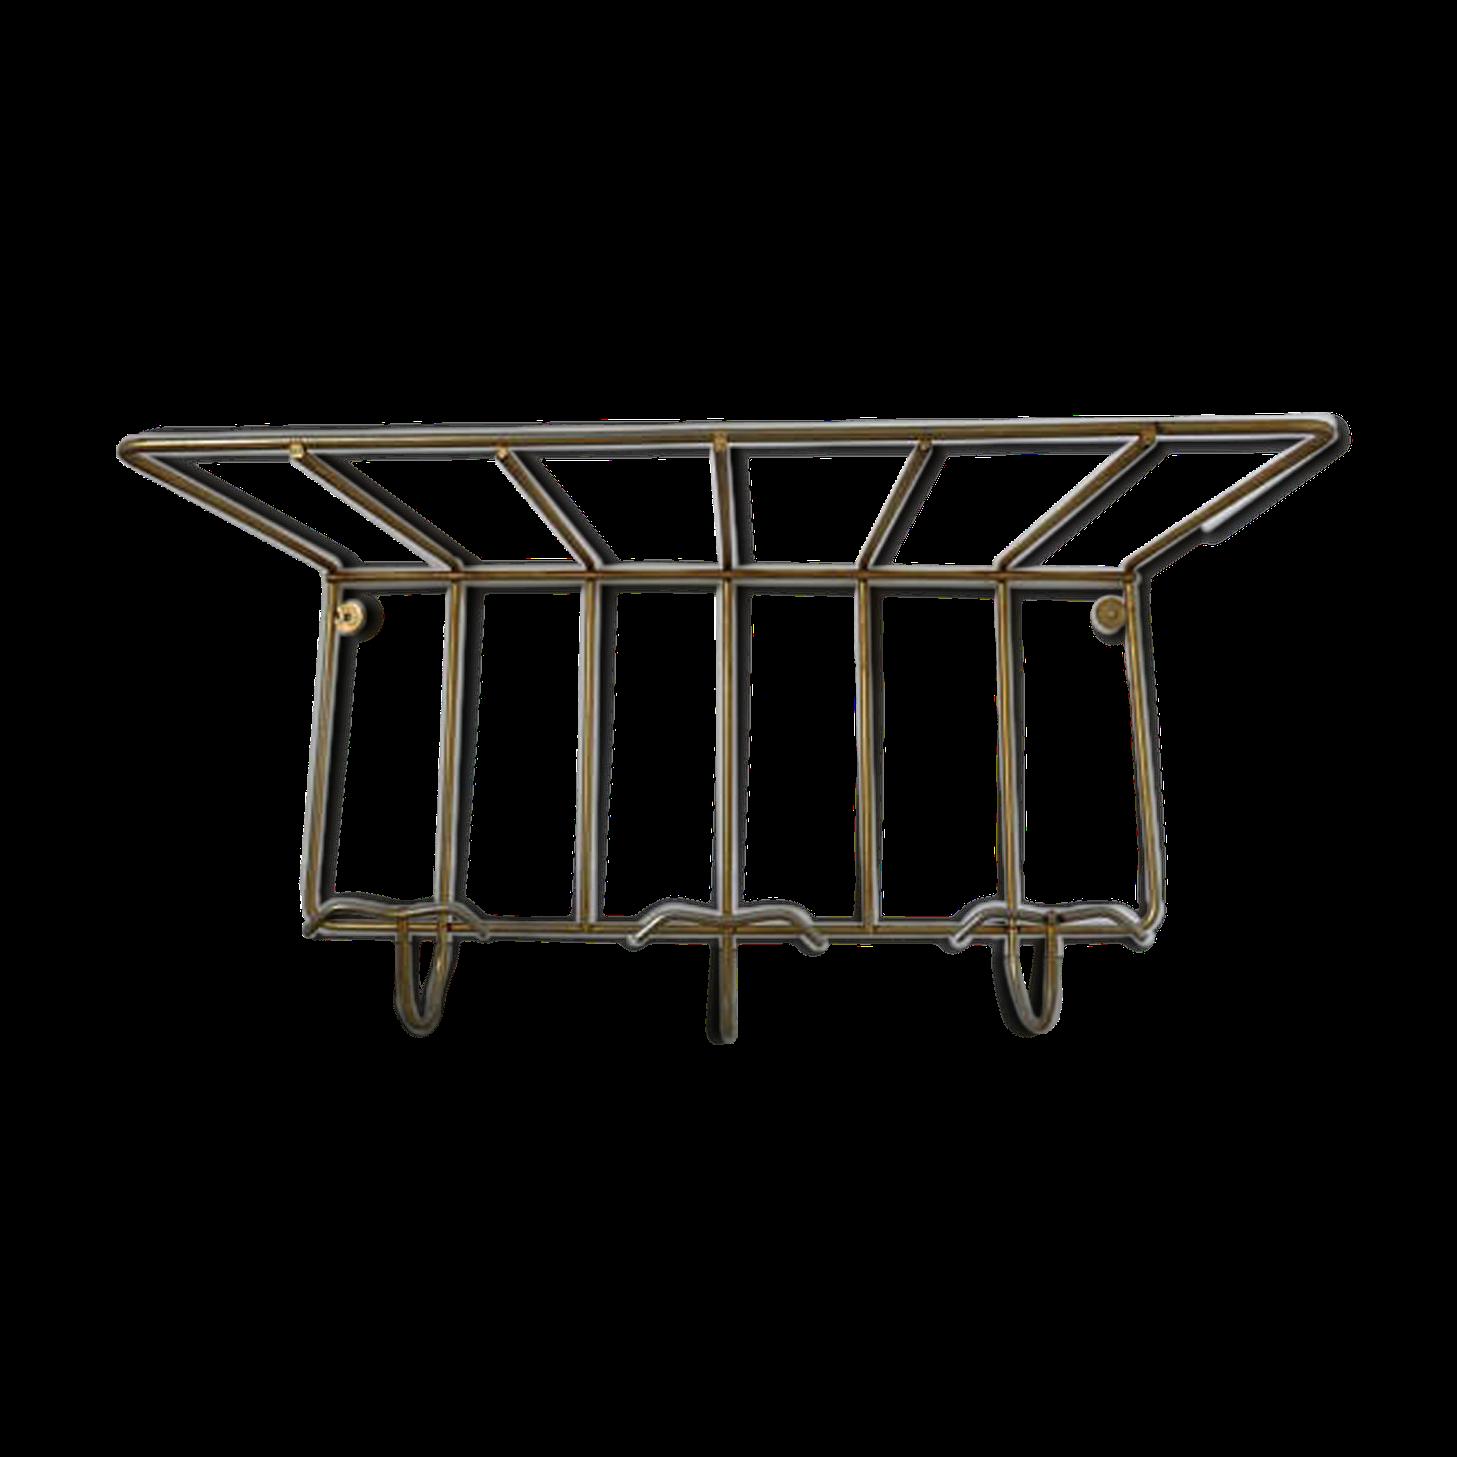 customiser un vestiaire metallique perfect best vestiaire mtallique portes with vestiaire. Black Bedroom Furniture Sets. Home Design Ideas